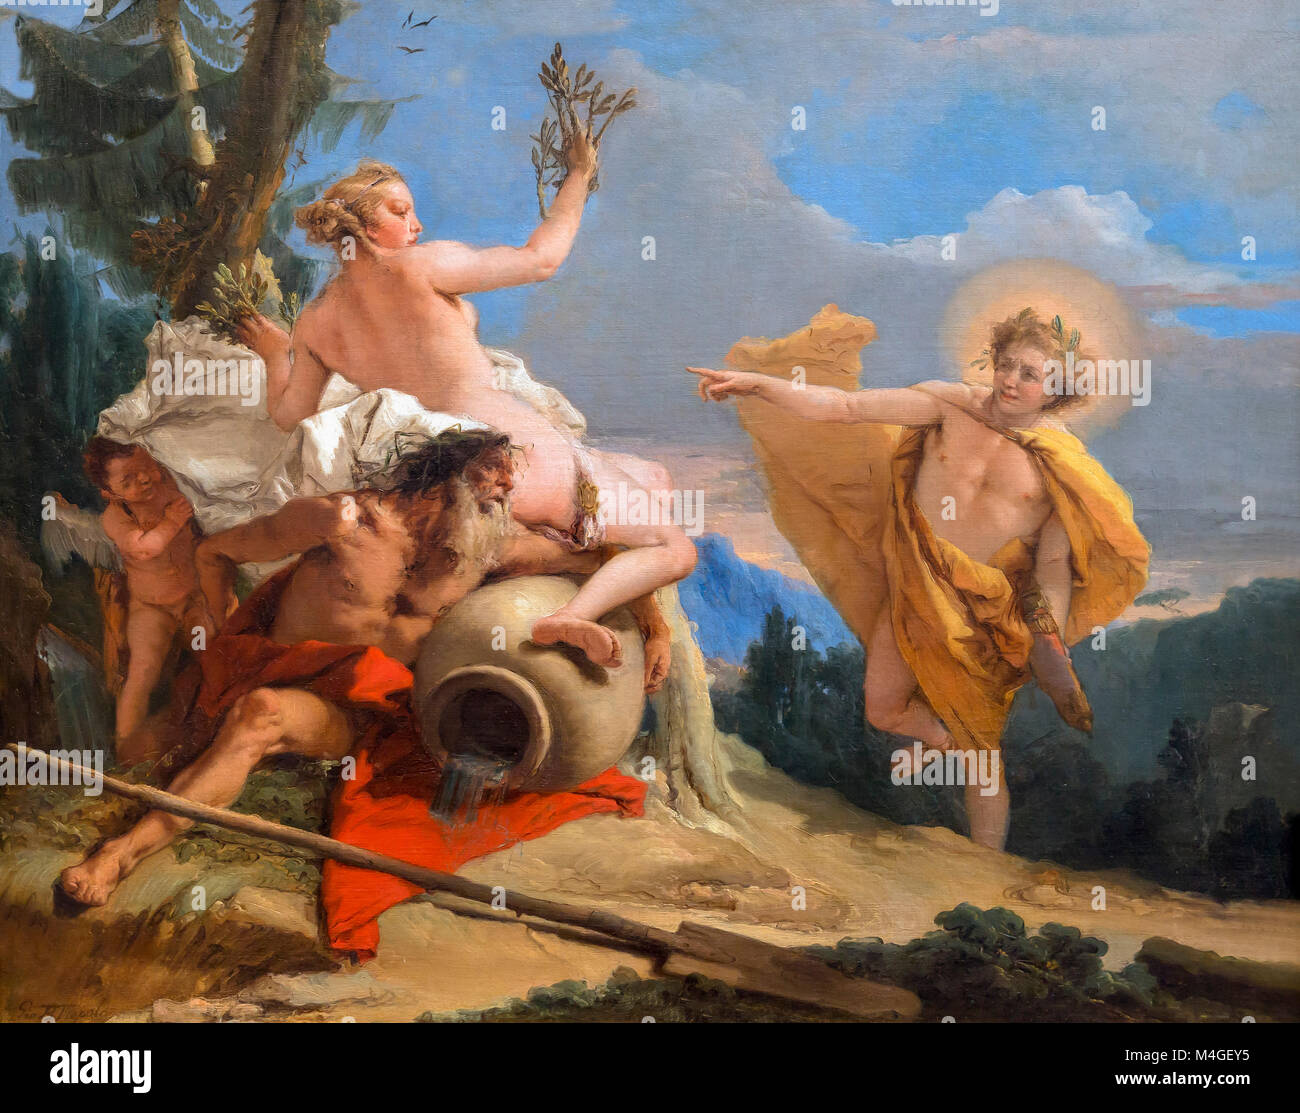 Apollo Pursuing Daphne, Giovanni Battista Tiepolo, circa 1755, National Gallery of Art, Washington DC, USA, North - Stock Image